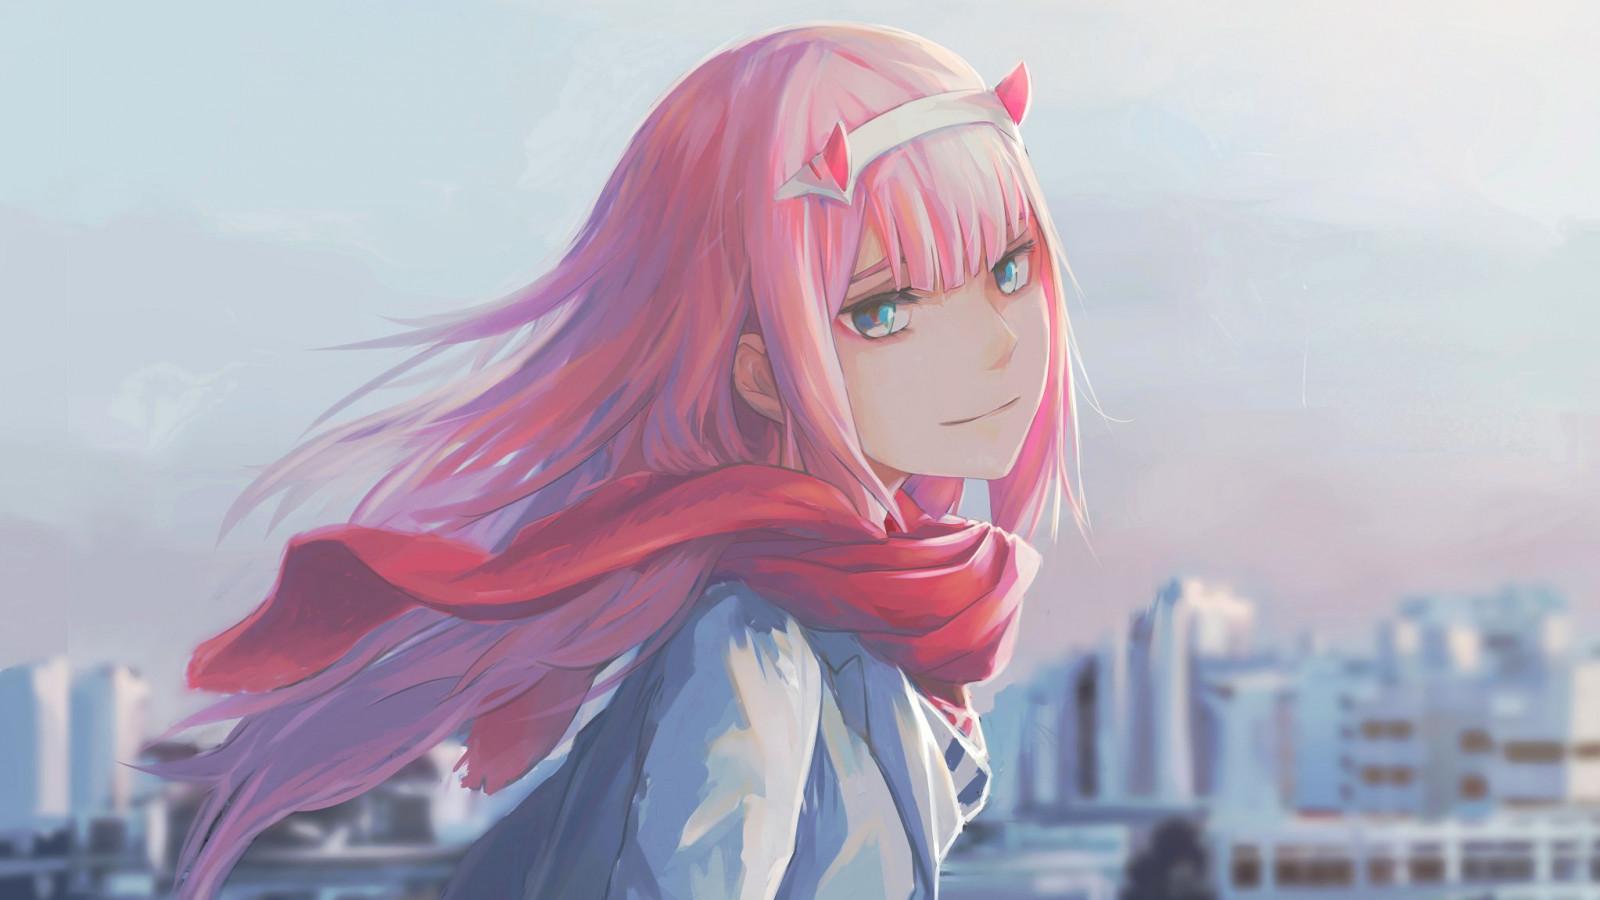 Wallpaper : anime girls, Zero Two, Zero Two Darling in the ...